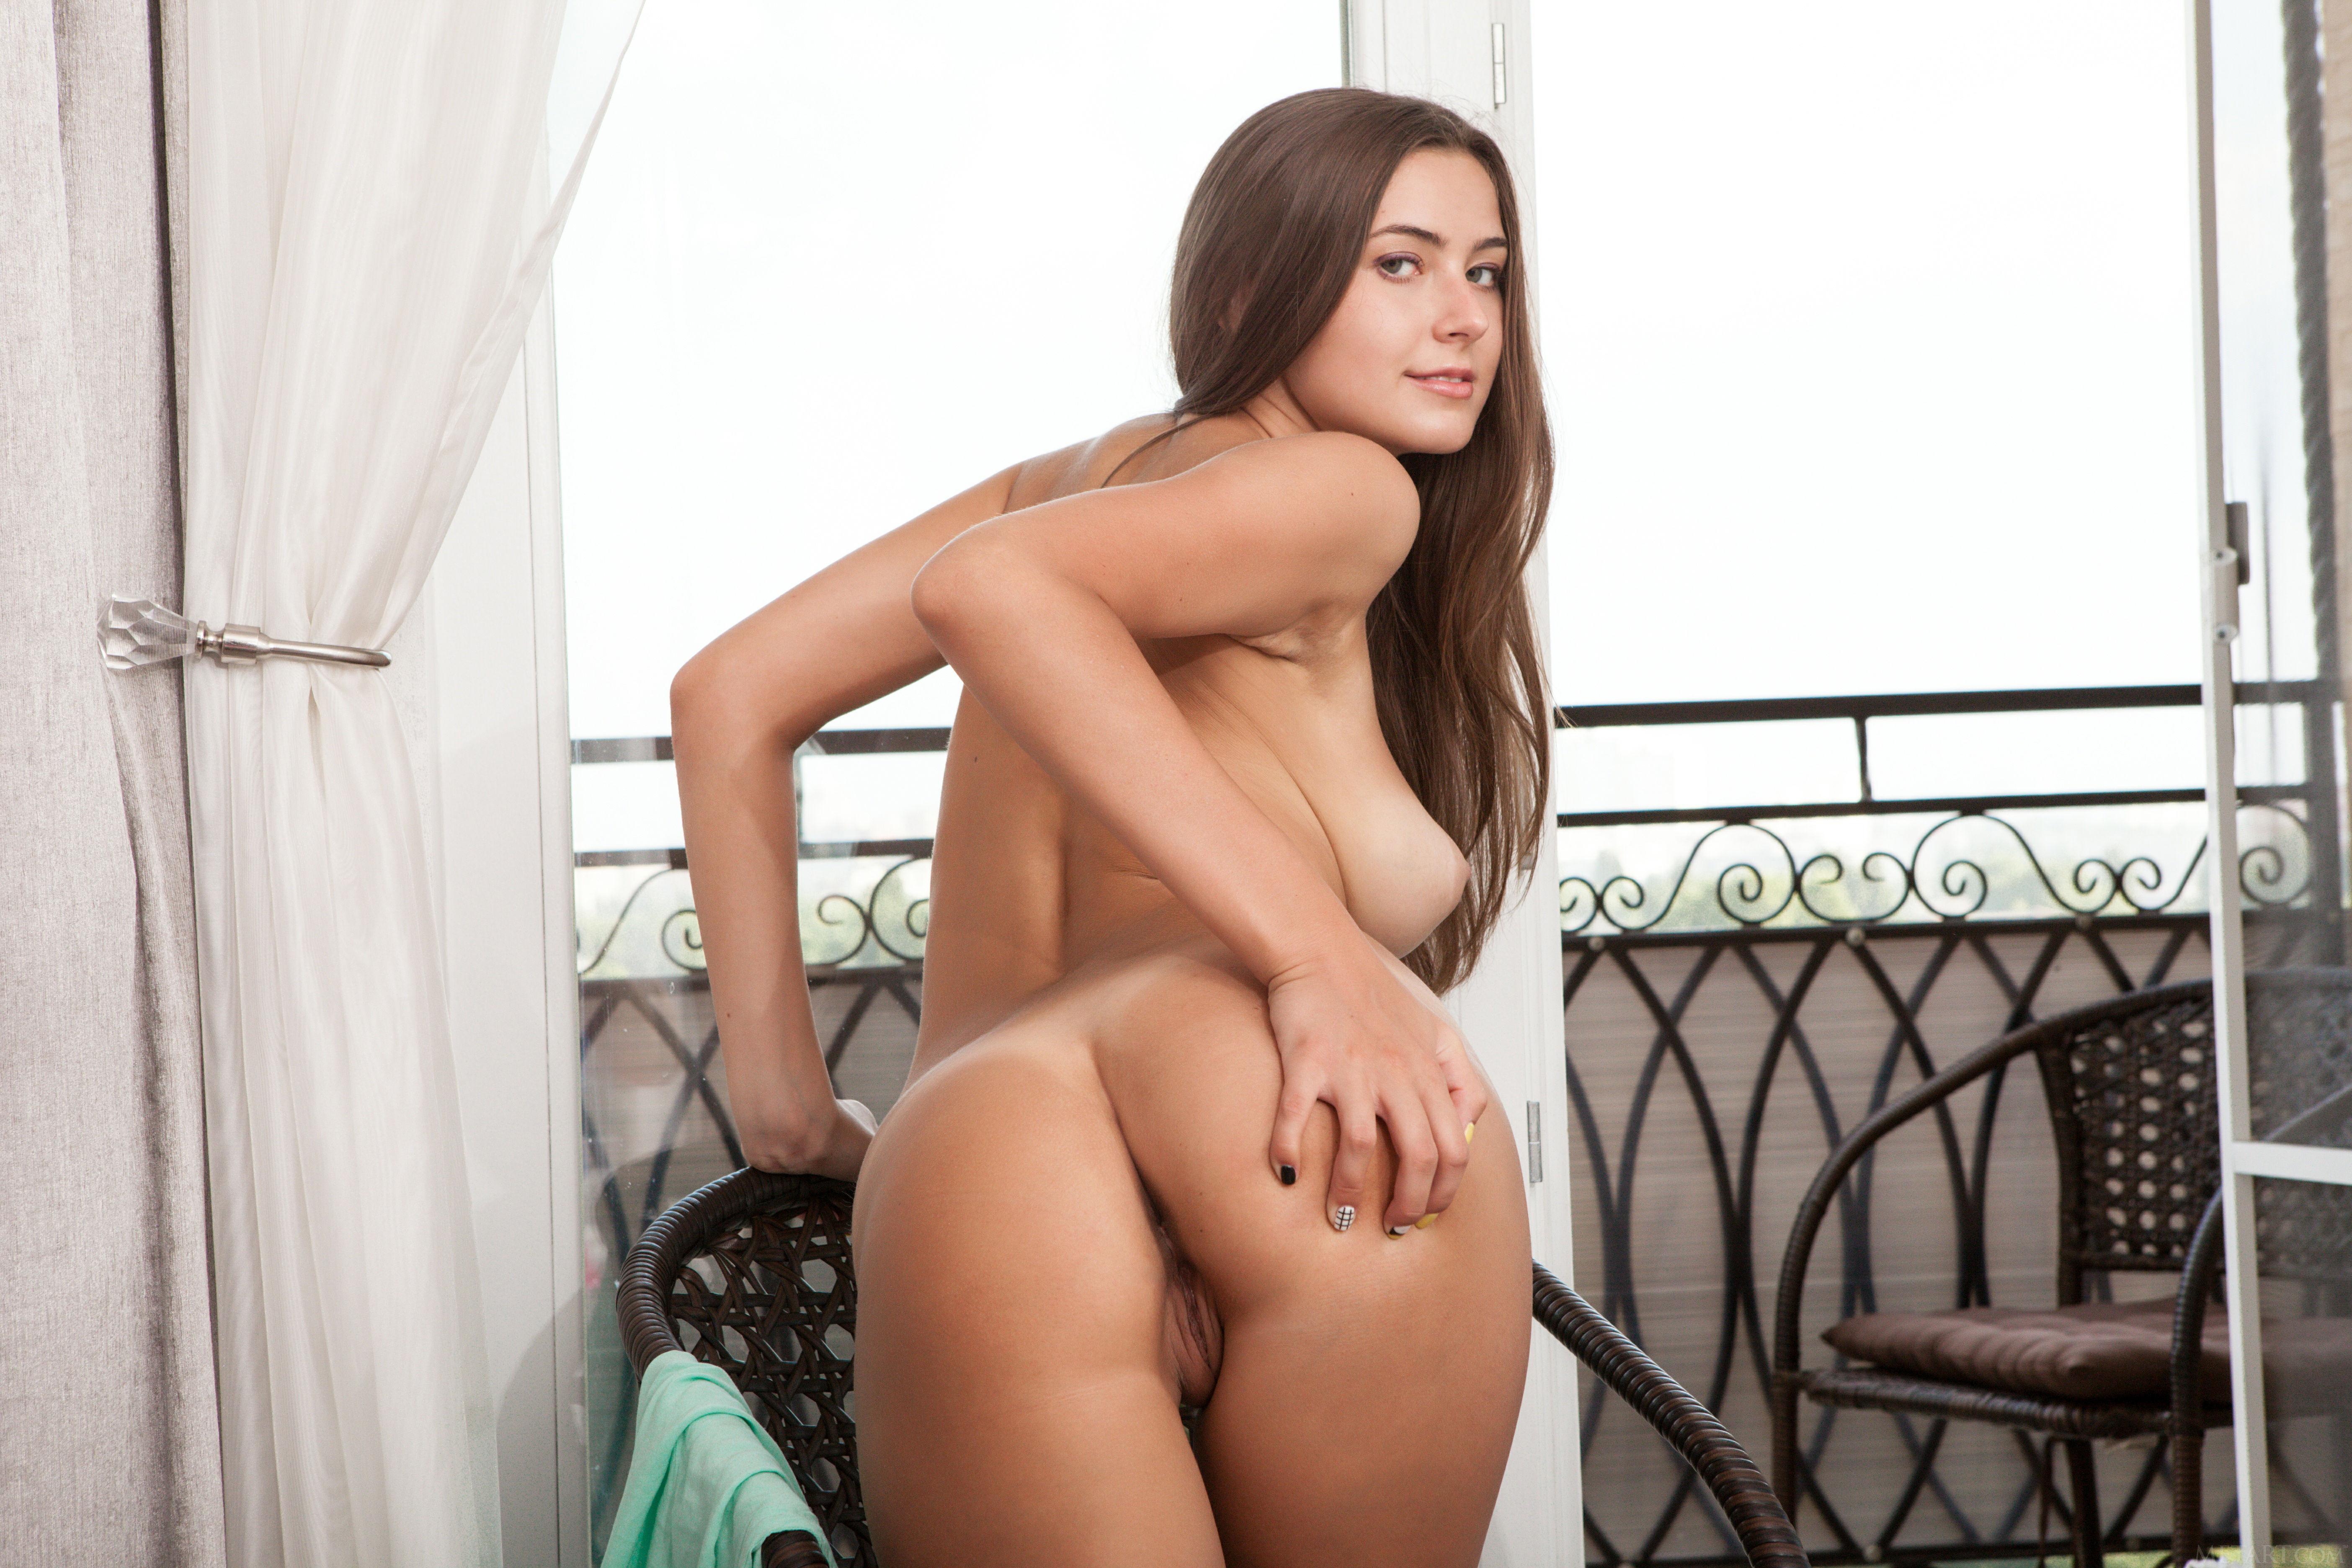 Cute euro girls naked